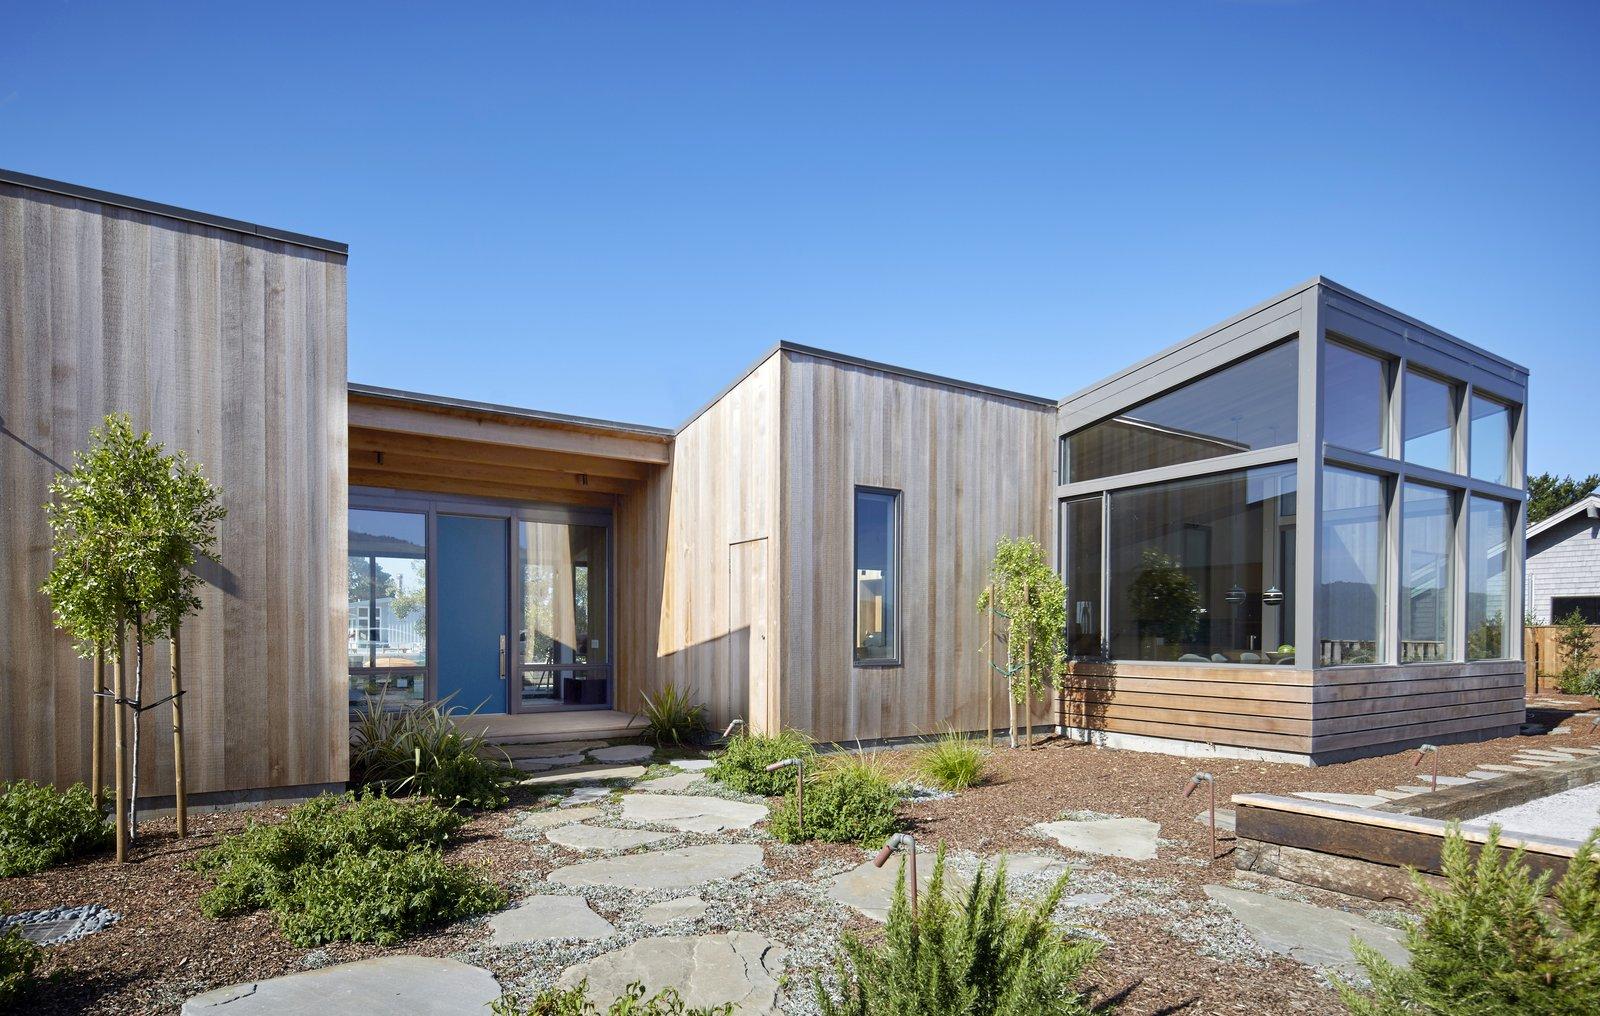 #TurnbullGriffinHaesloop #outdoor #exterior #landscape #window   Stinson Beach Lagoon Residence by Turnbull Griffin Haesloop Architects